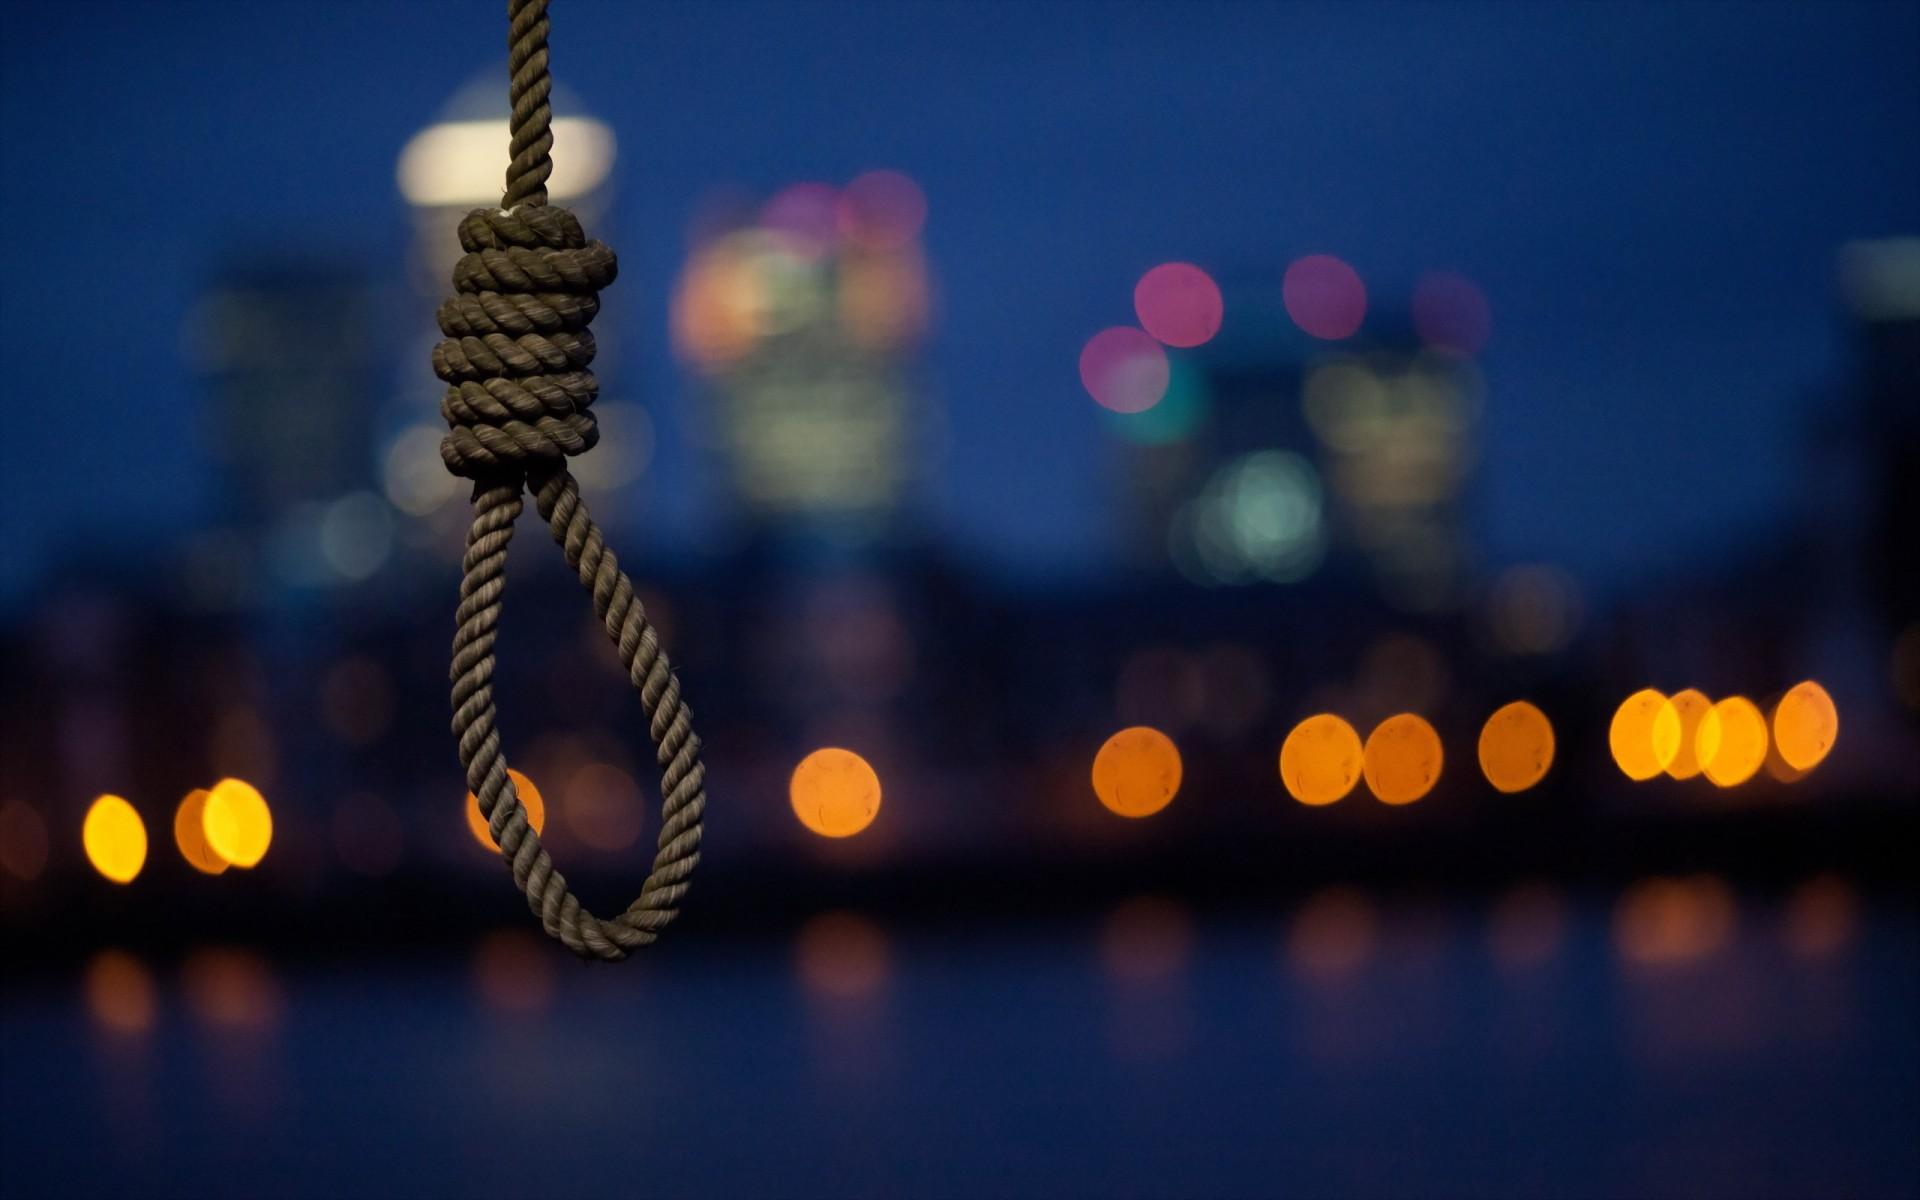 insan-neden-intihar-eder